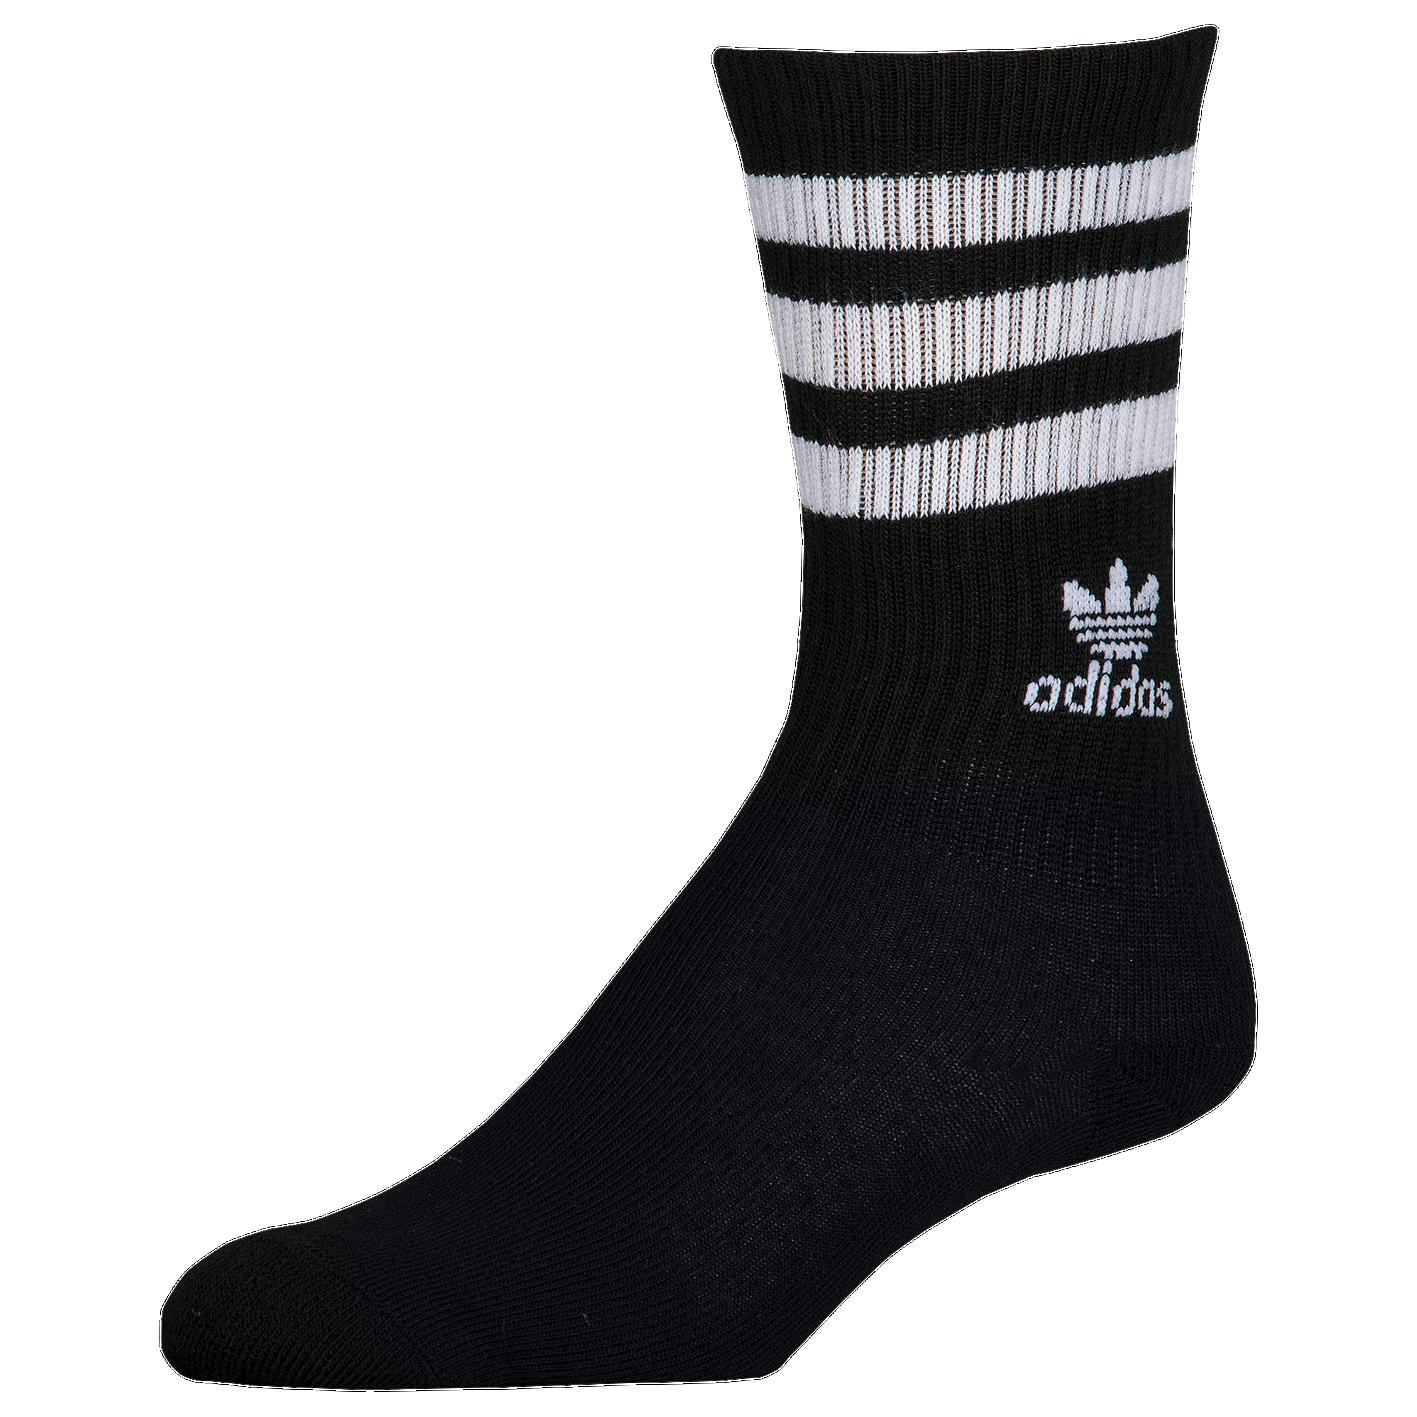 805f41622 adidas Originals Trefoil Roller Crew Socks - Women s - Casual ...